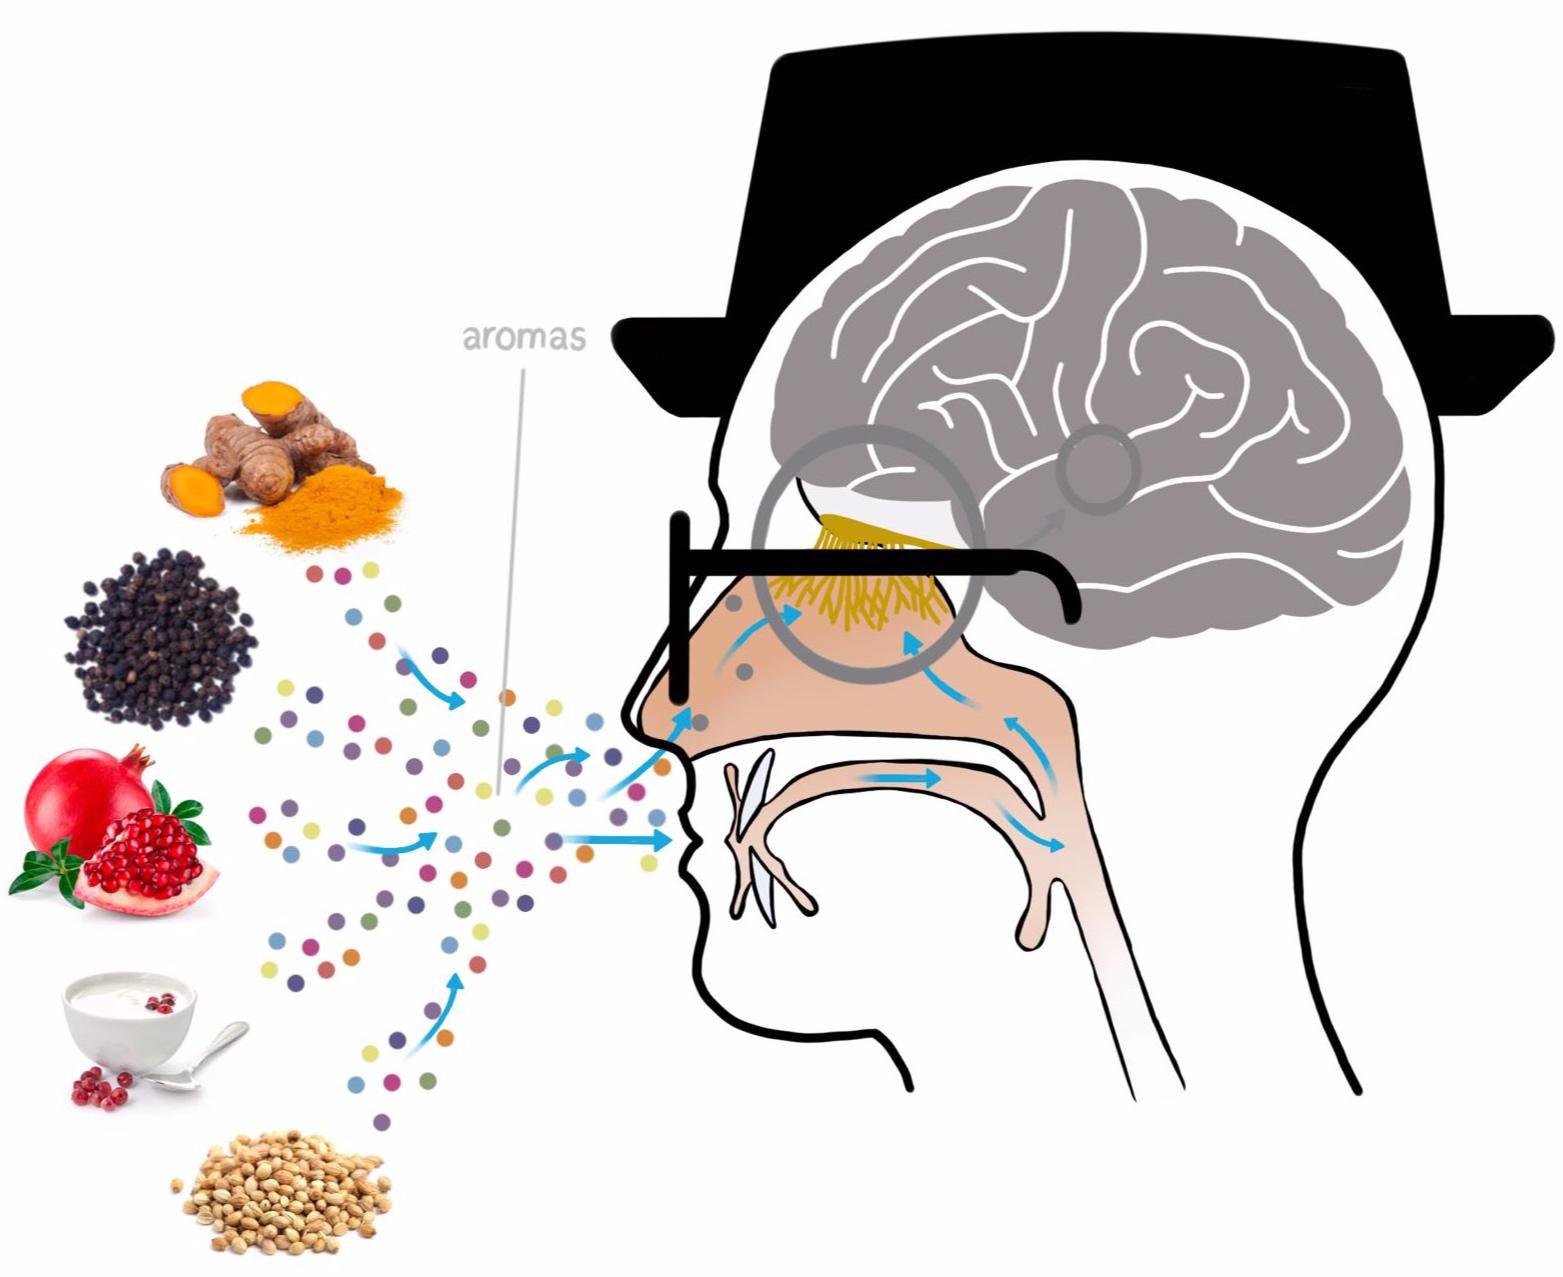 taste-diagram.jpg